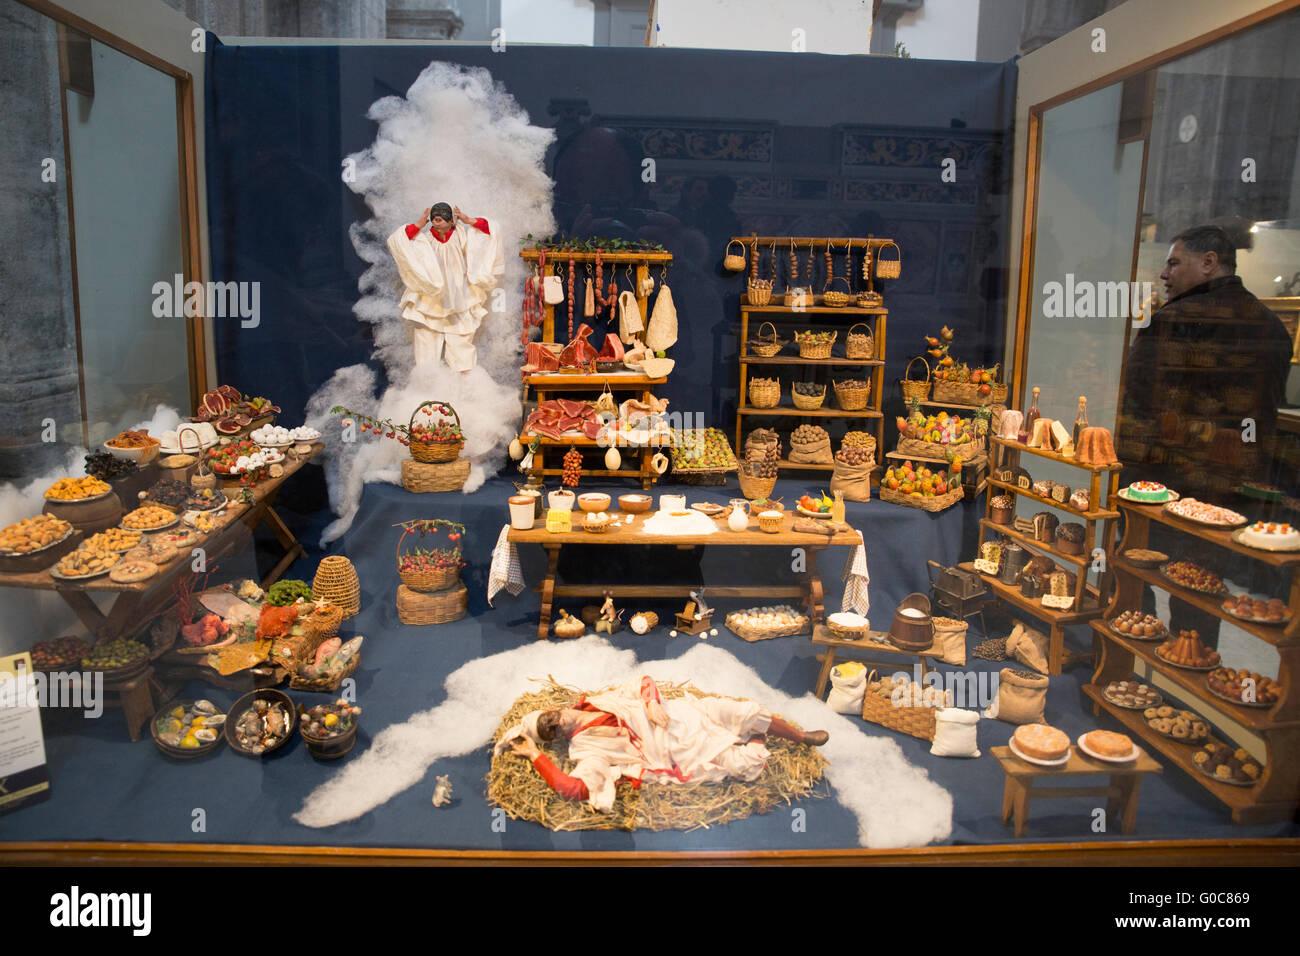 Santons workshop in San Gregorio Armeno street, Naples, Campania region, southern Italy, Europe Stock Photo